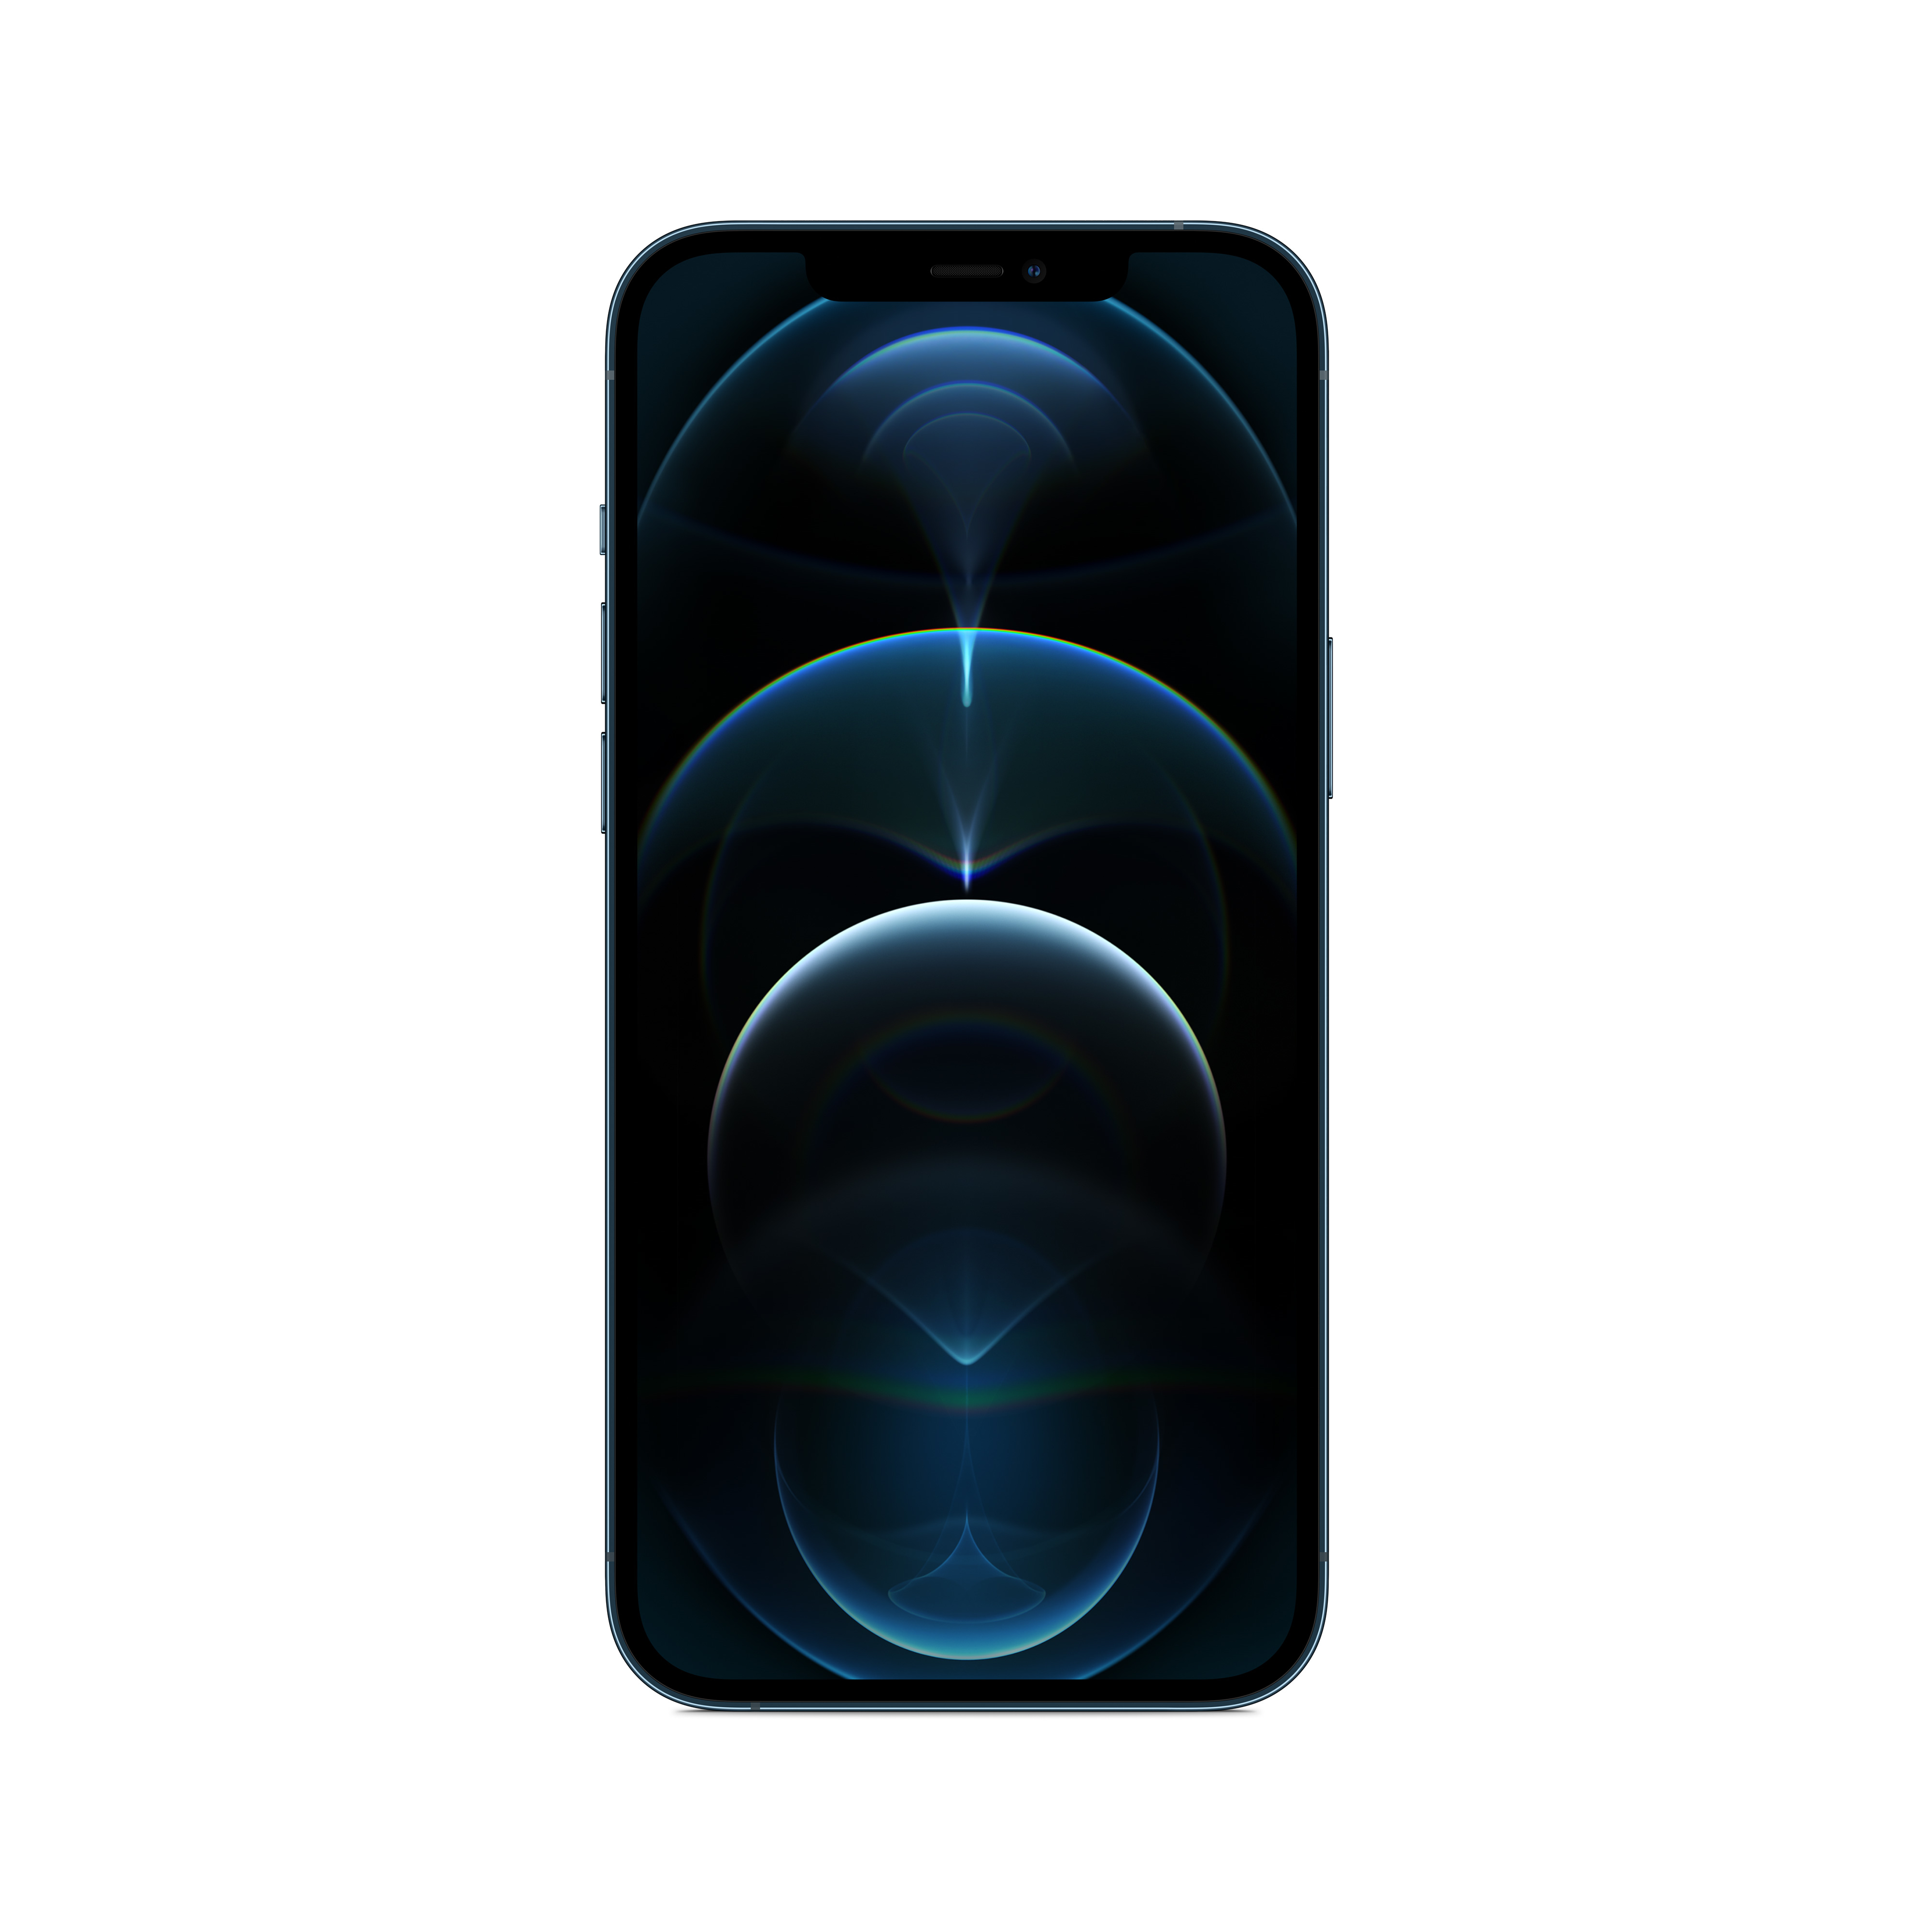 Apple - iPhone 12 Pro Max 128gb Pacific Blu